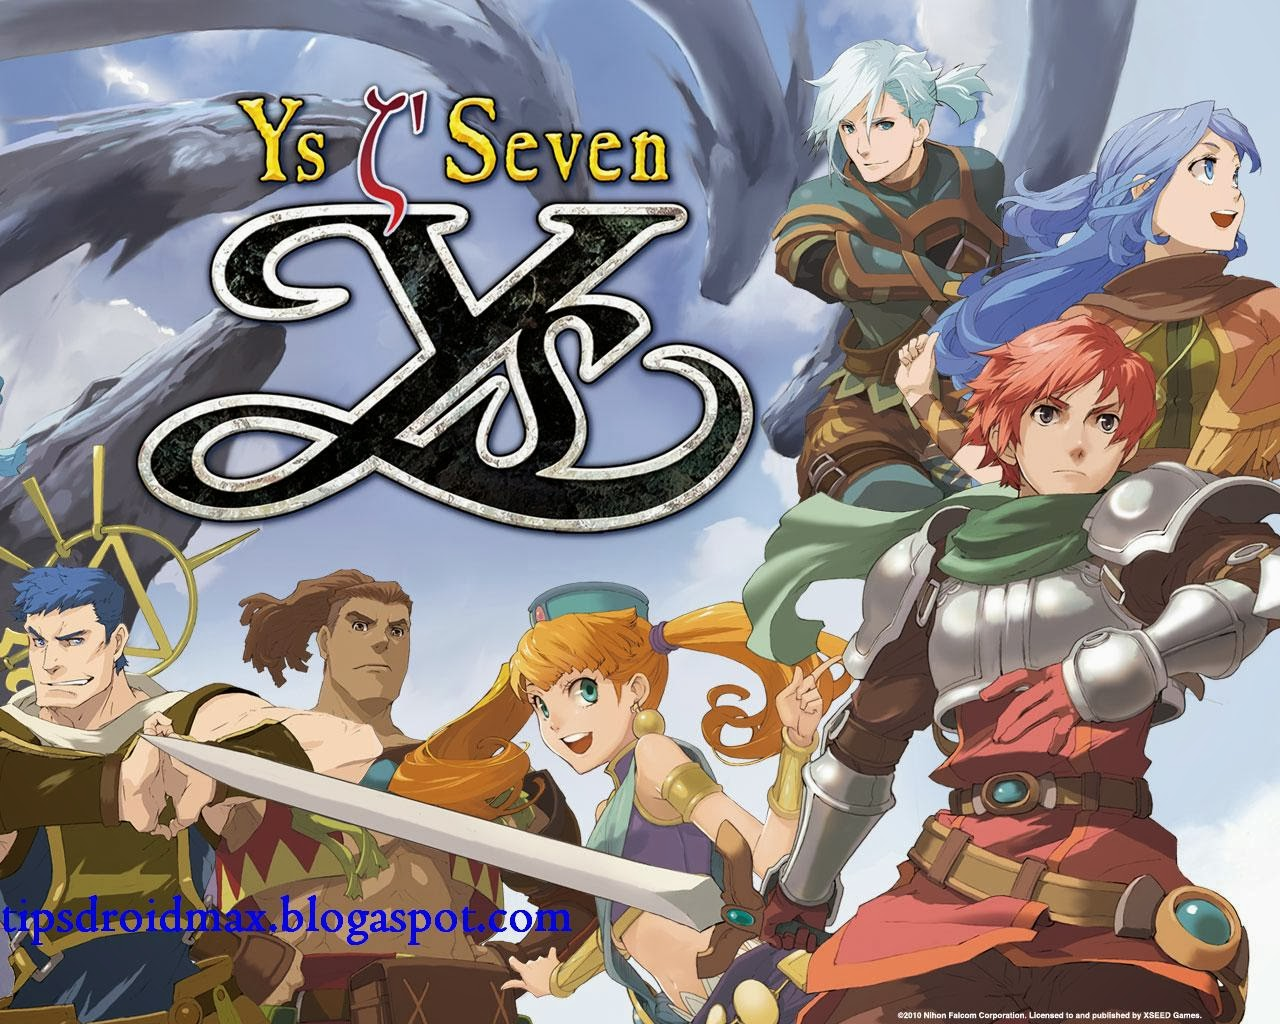 Download YS Seven PSP